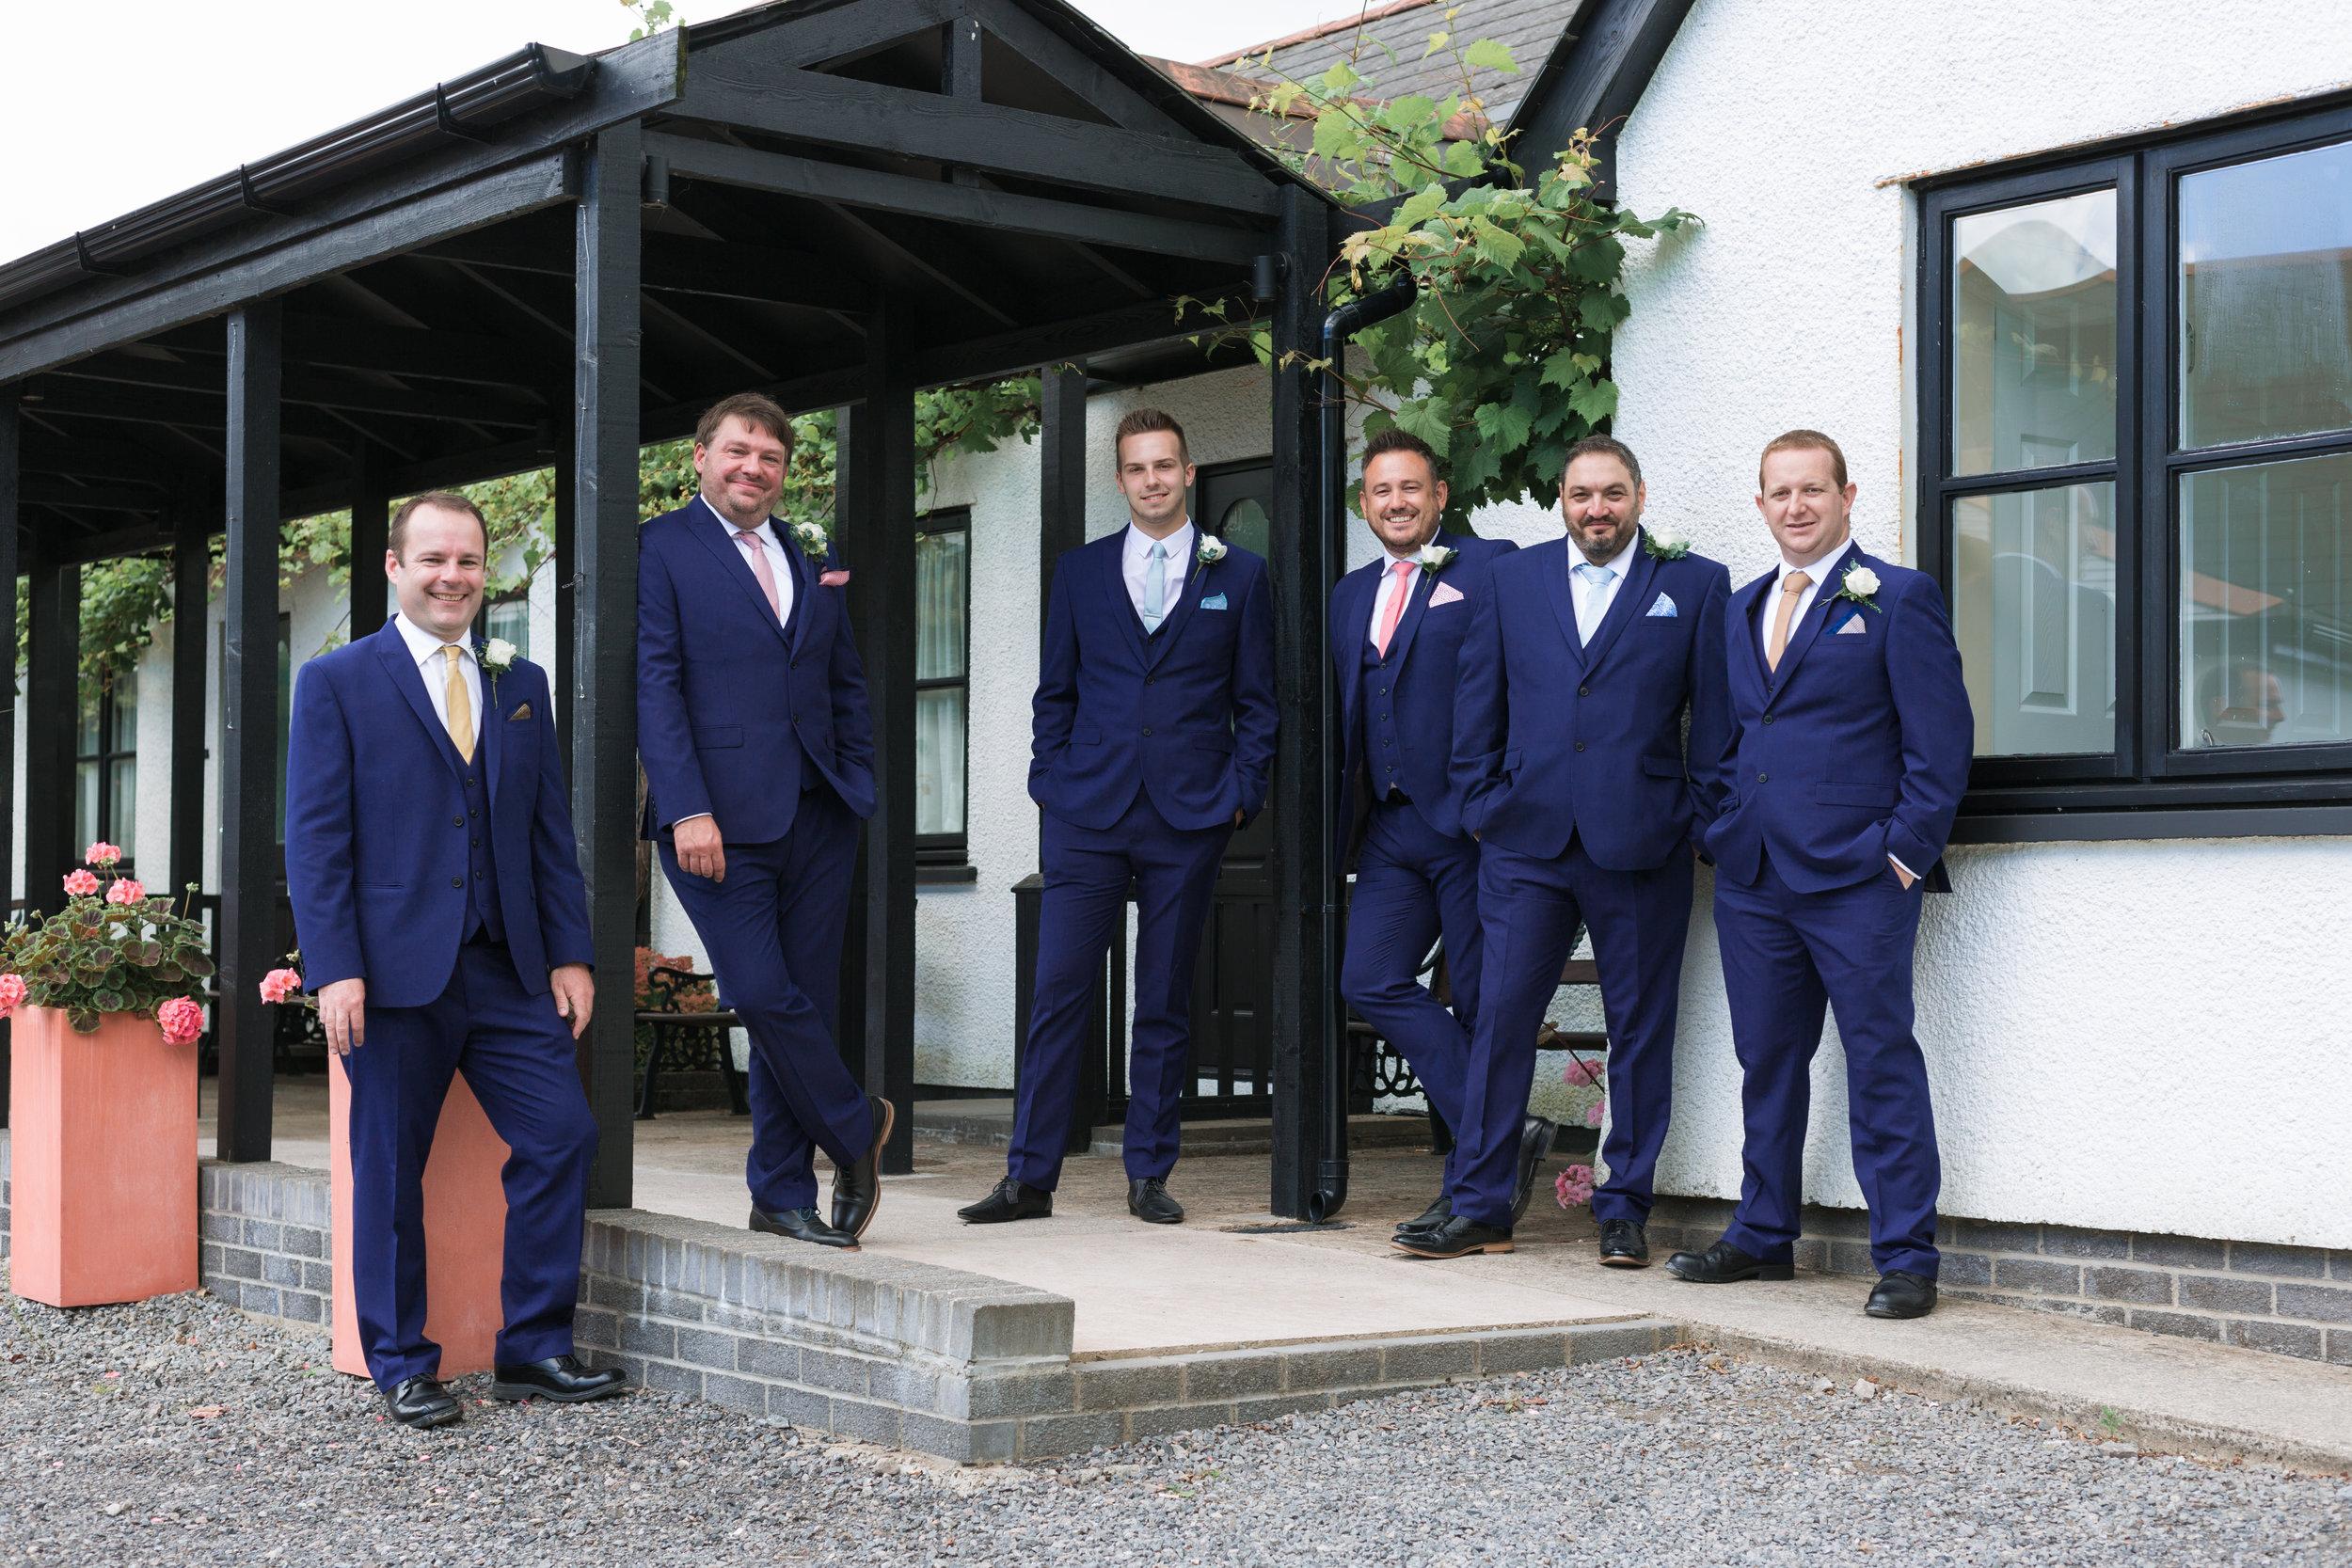 Groomsmen at Llanerch Vineyard. wedding photographer llanerch vineyard